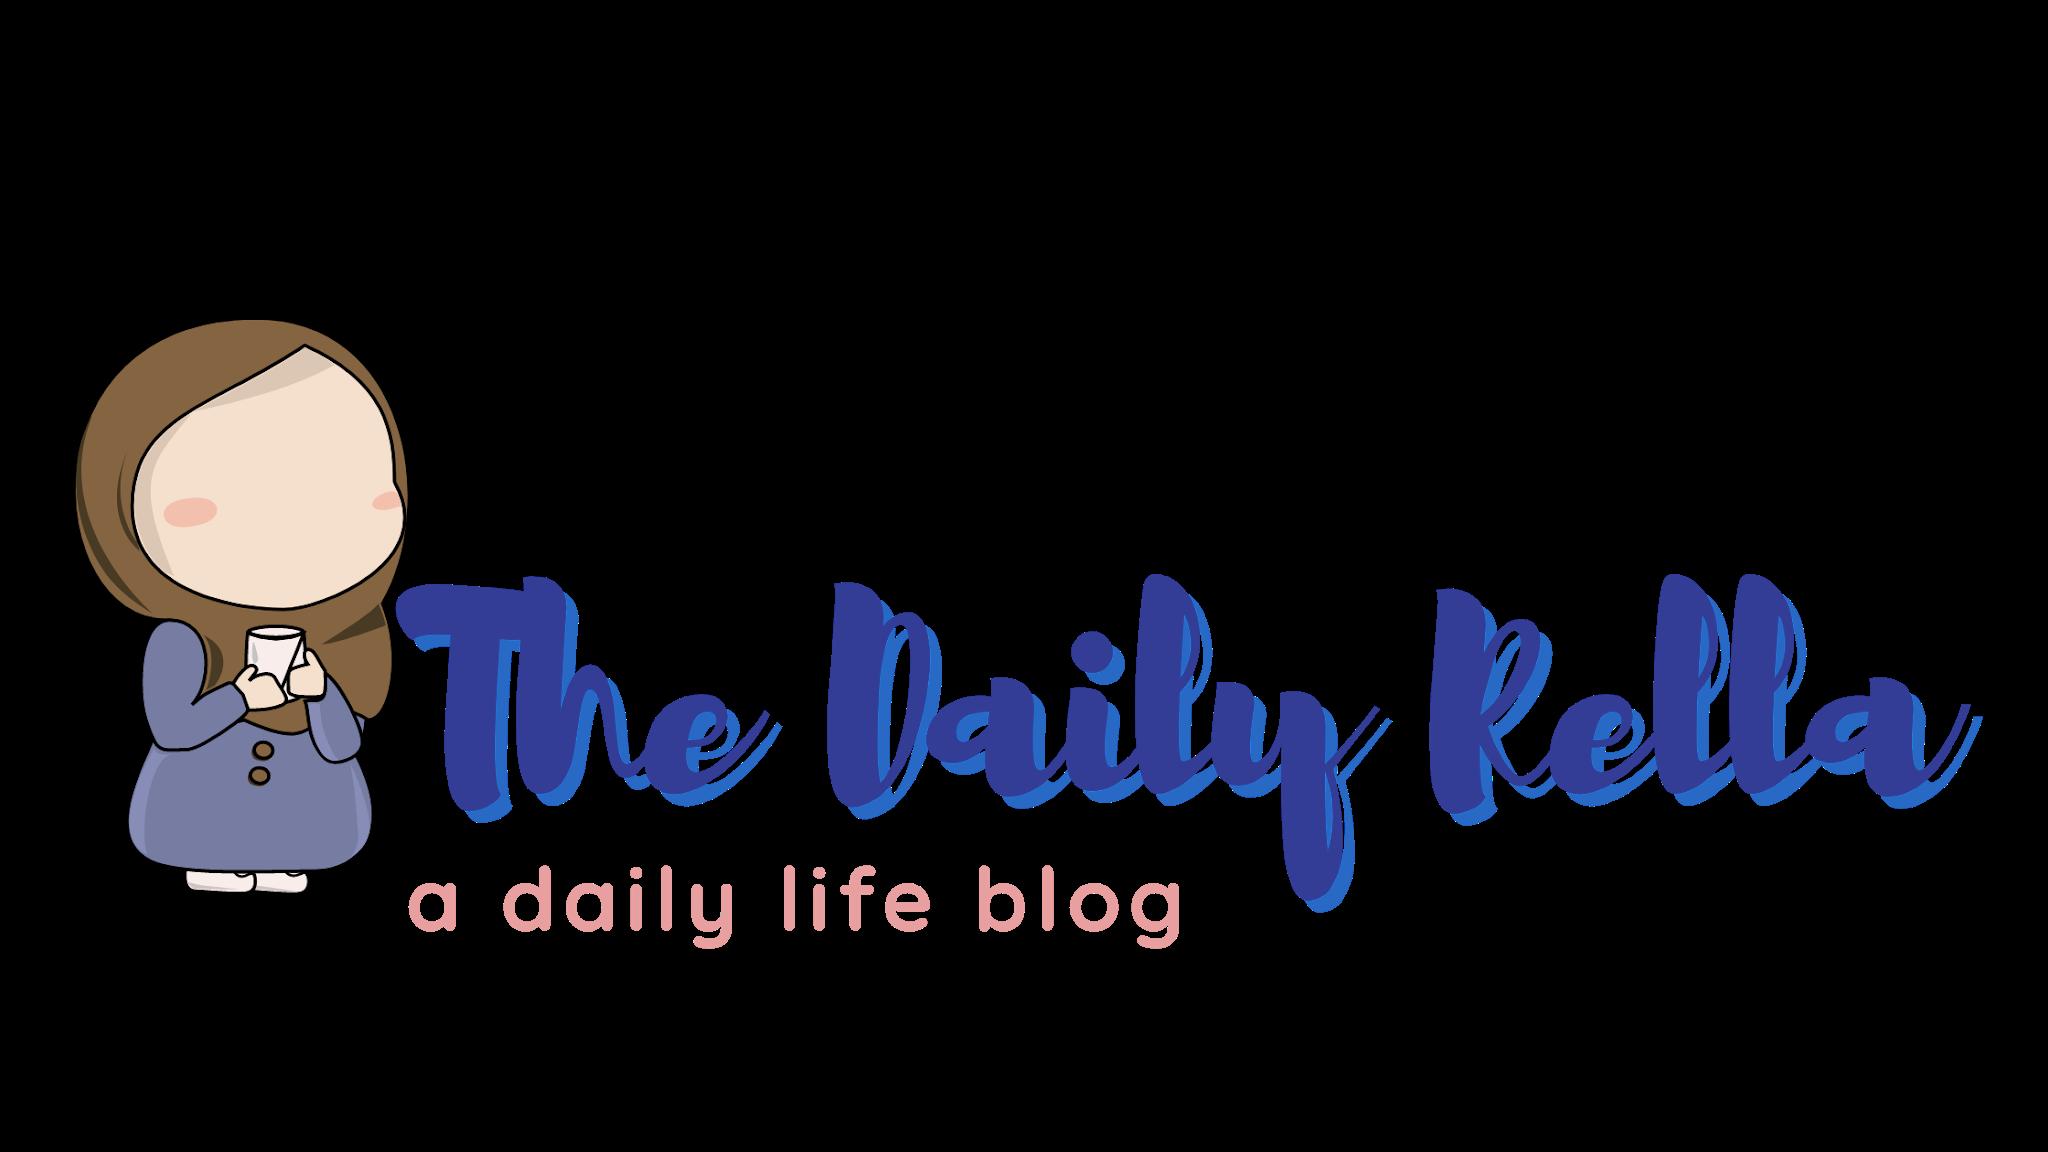 The Daily Rella